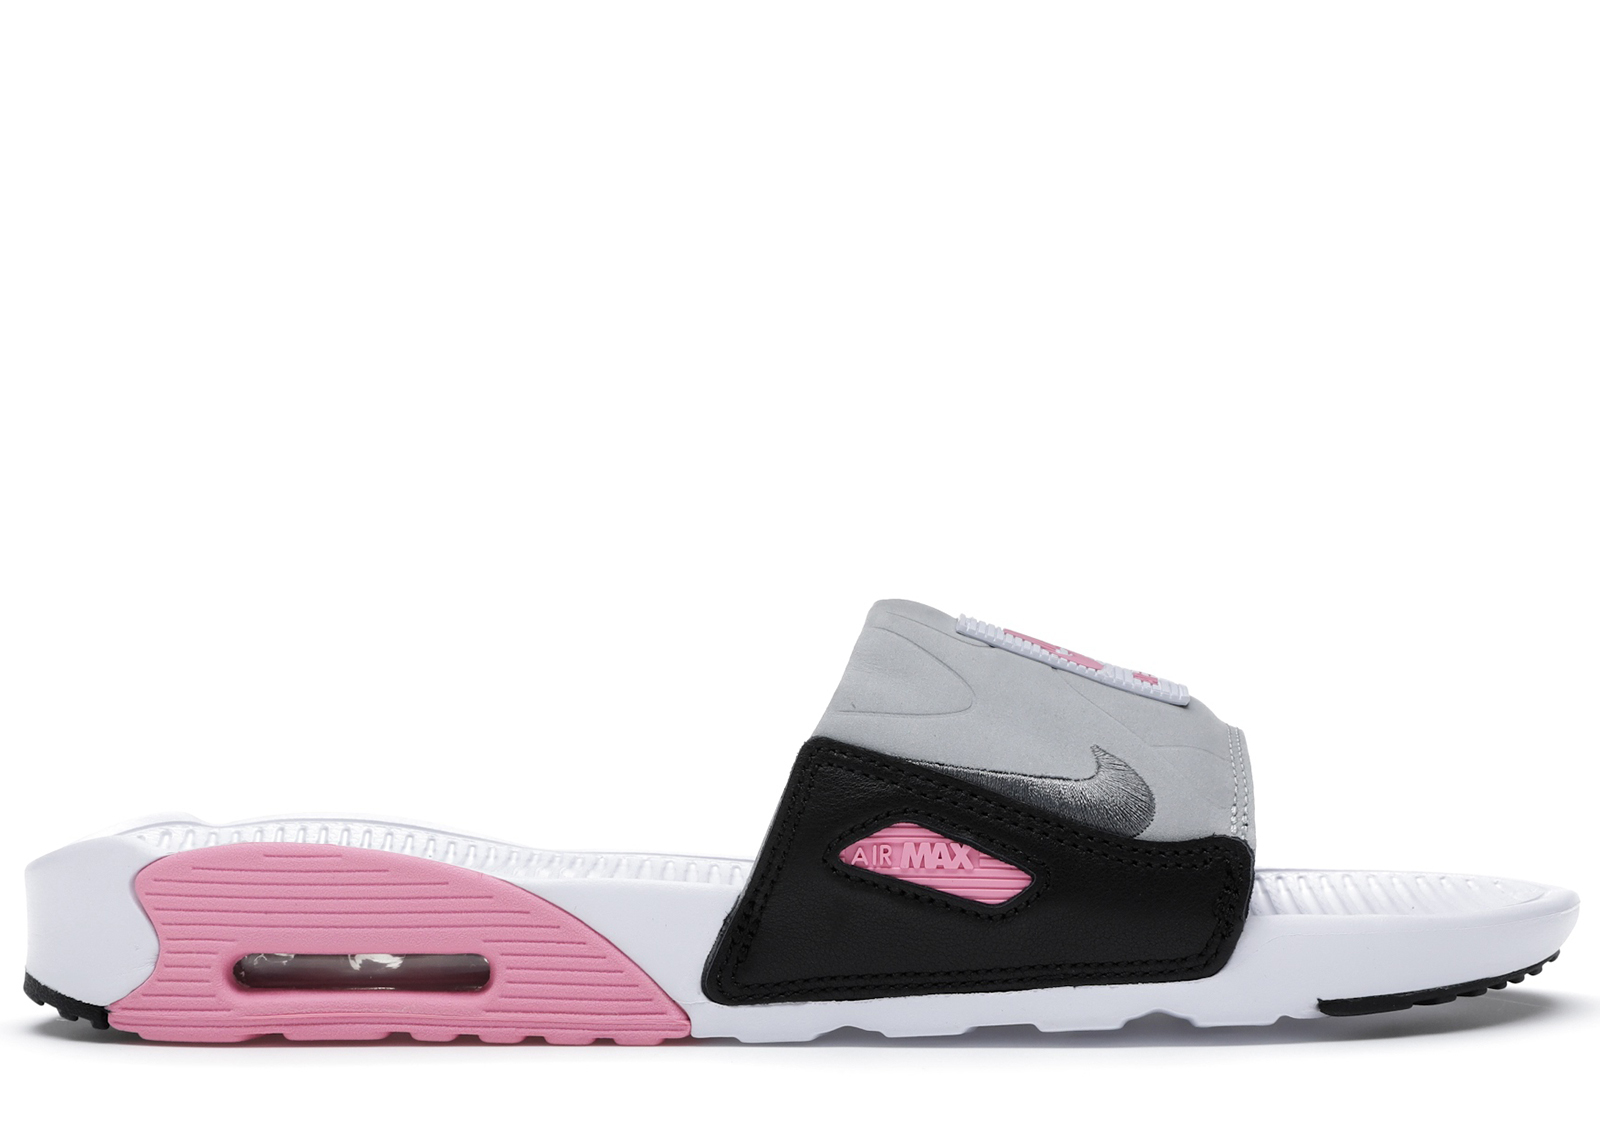 Nike Air Max 90 Slide White Rose Cool Grey - BQ4635-100